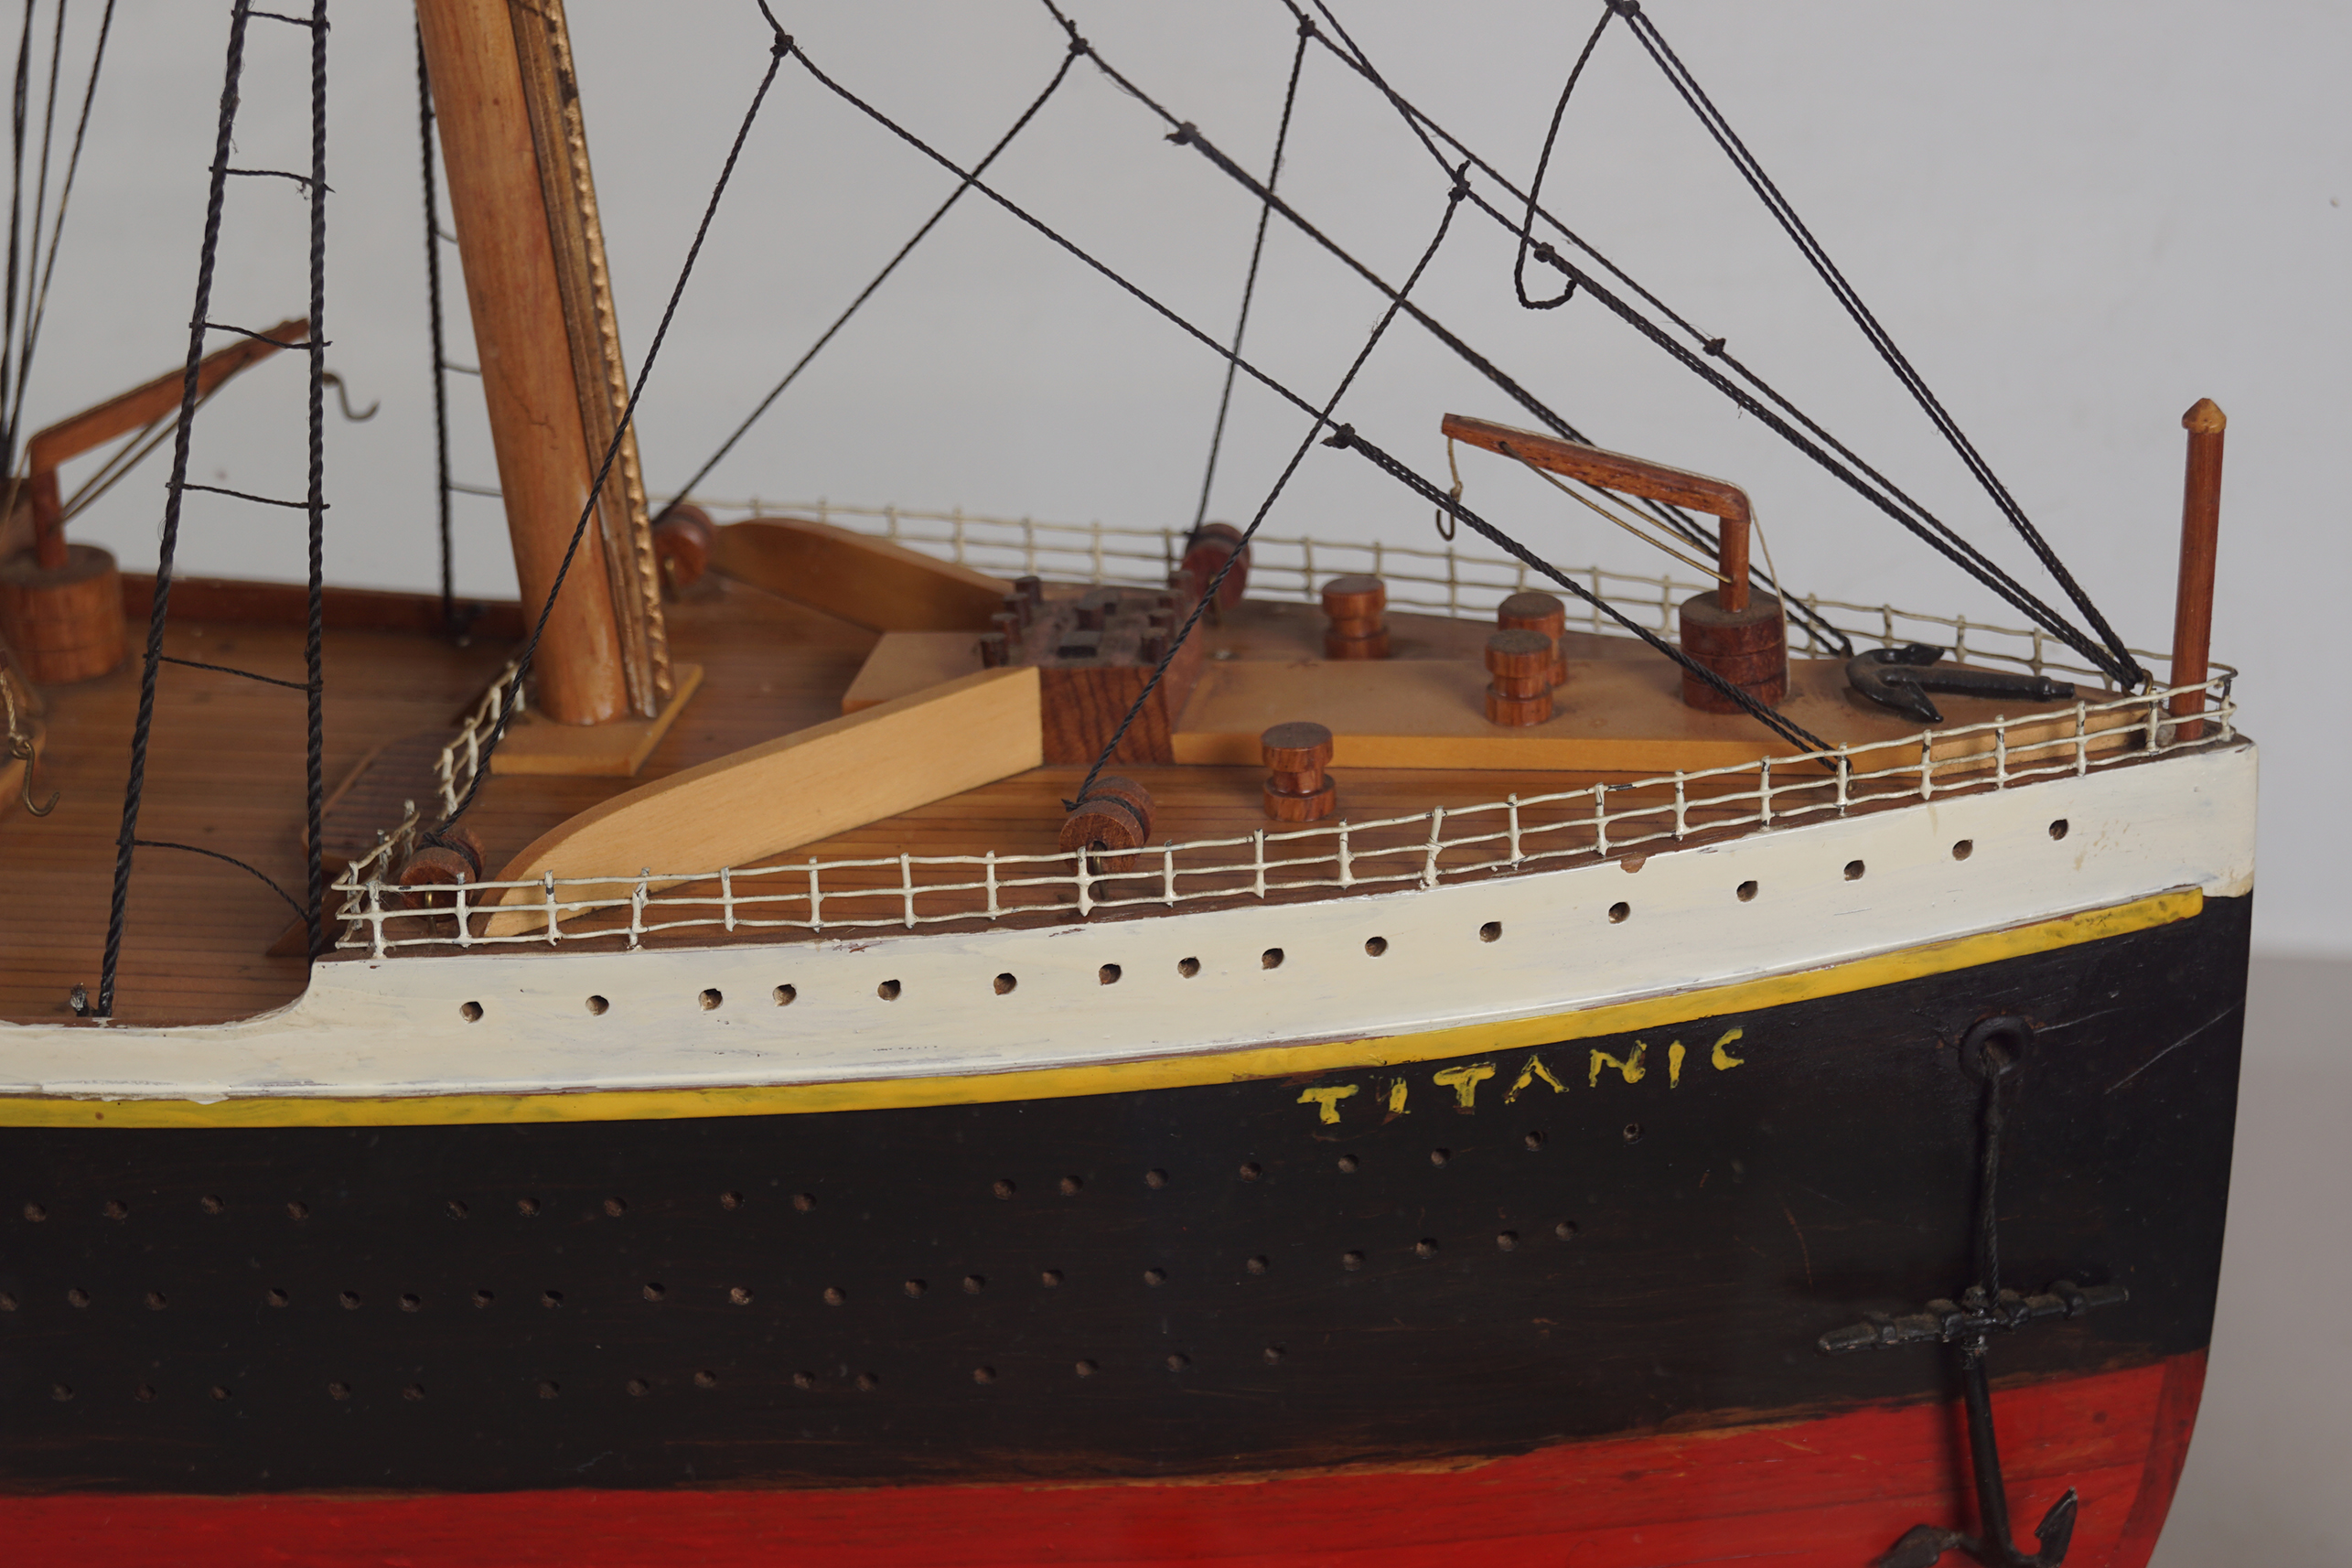 LARGE MODEL STEAM SHIP - Image 3 of 8